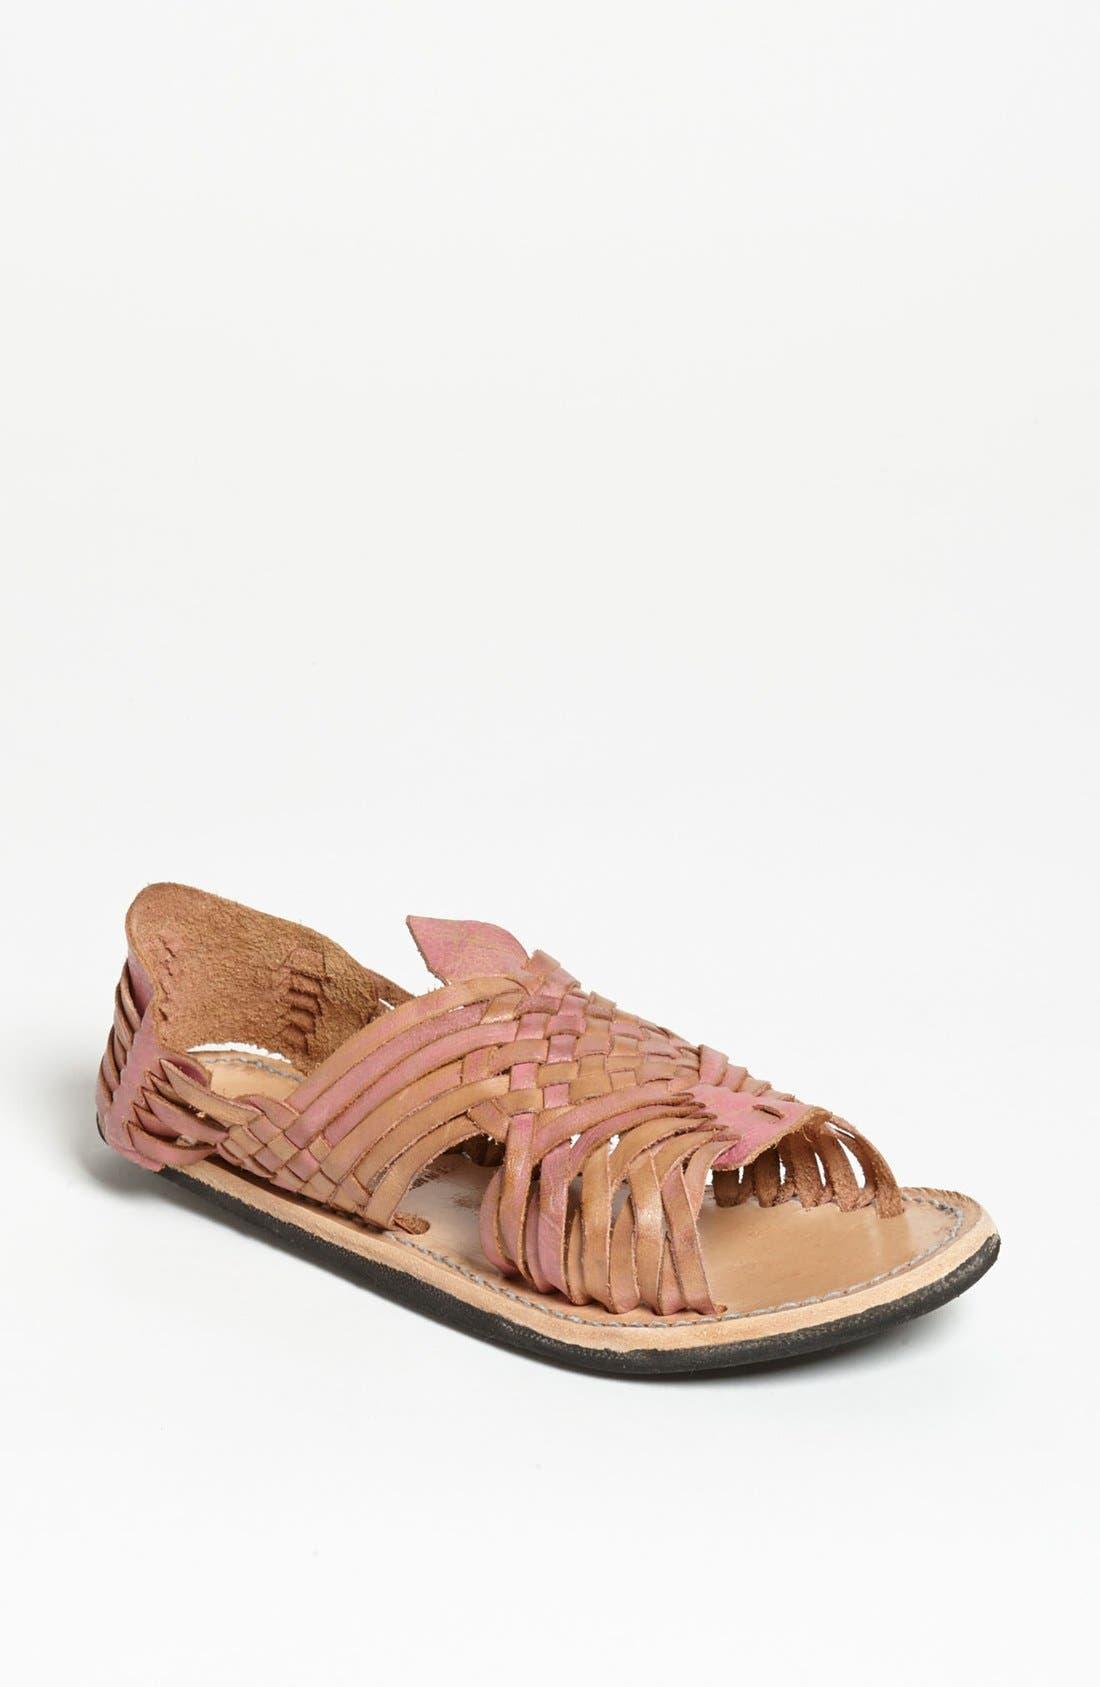 Alternate Image 1 Selected - Bed Stu 'Lauren' Sandal